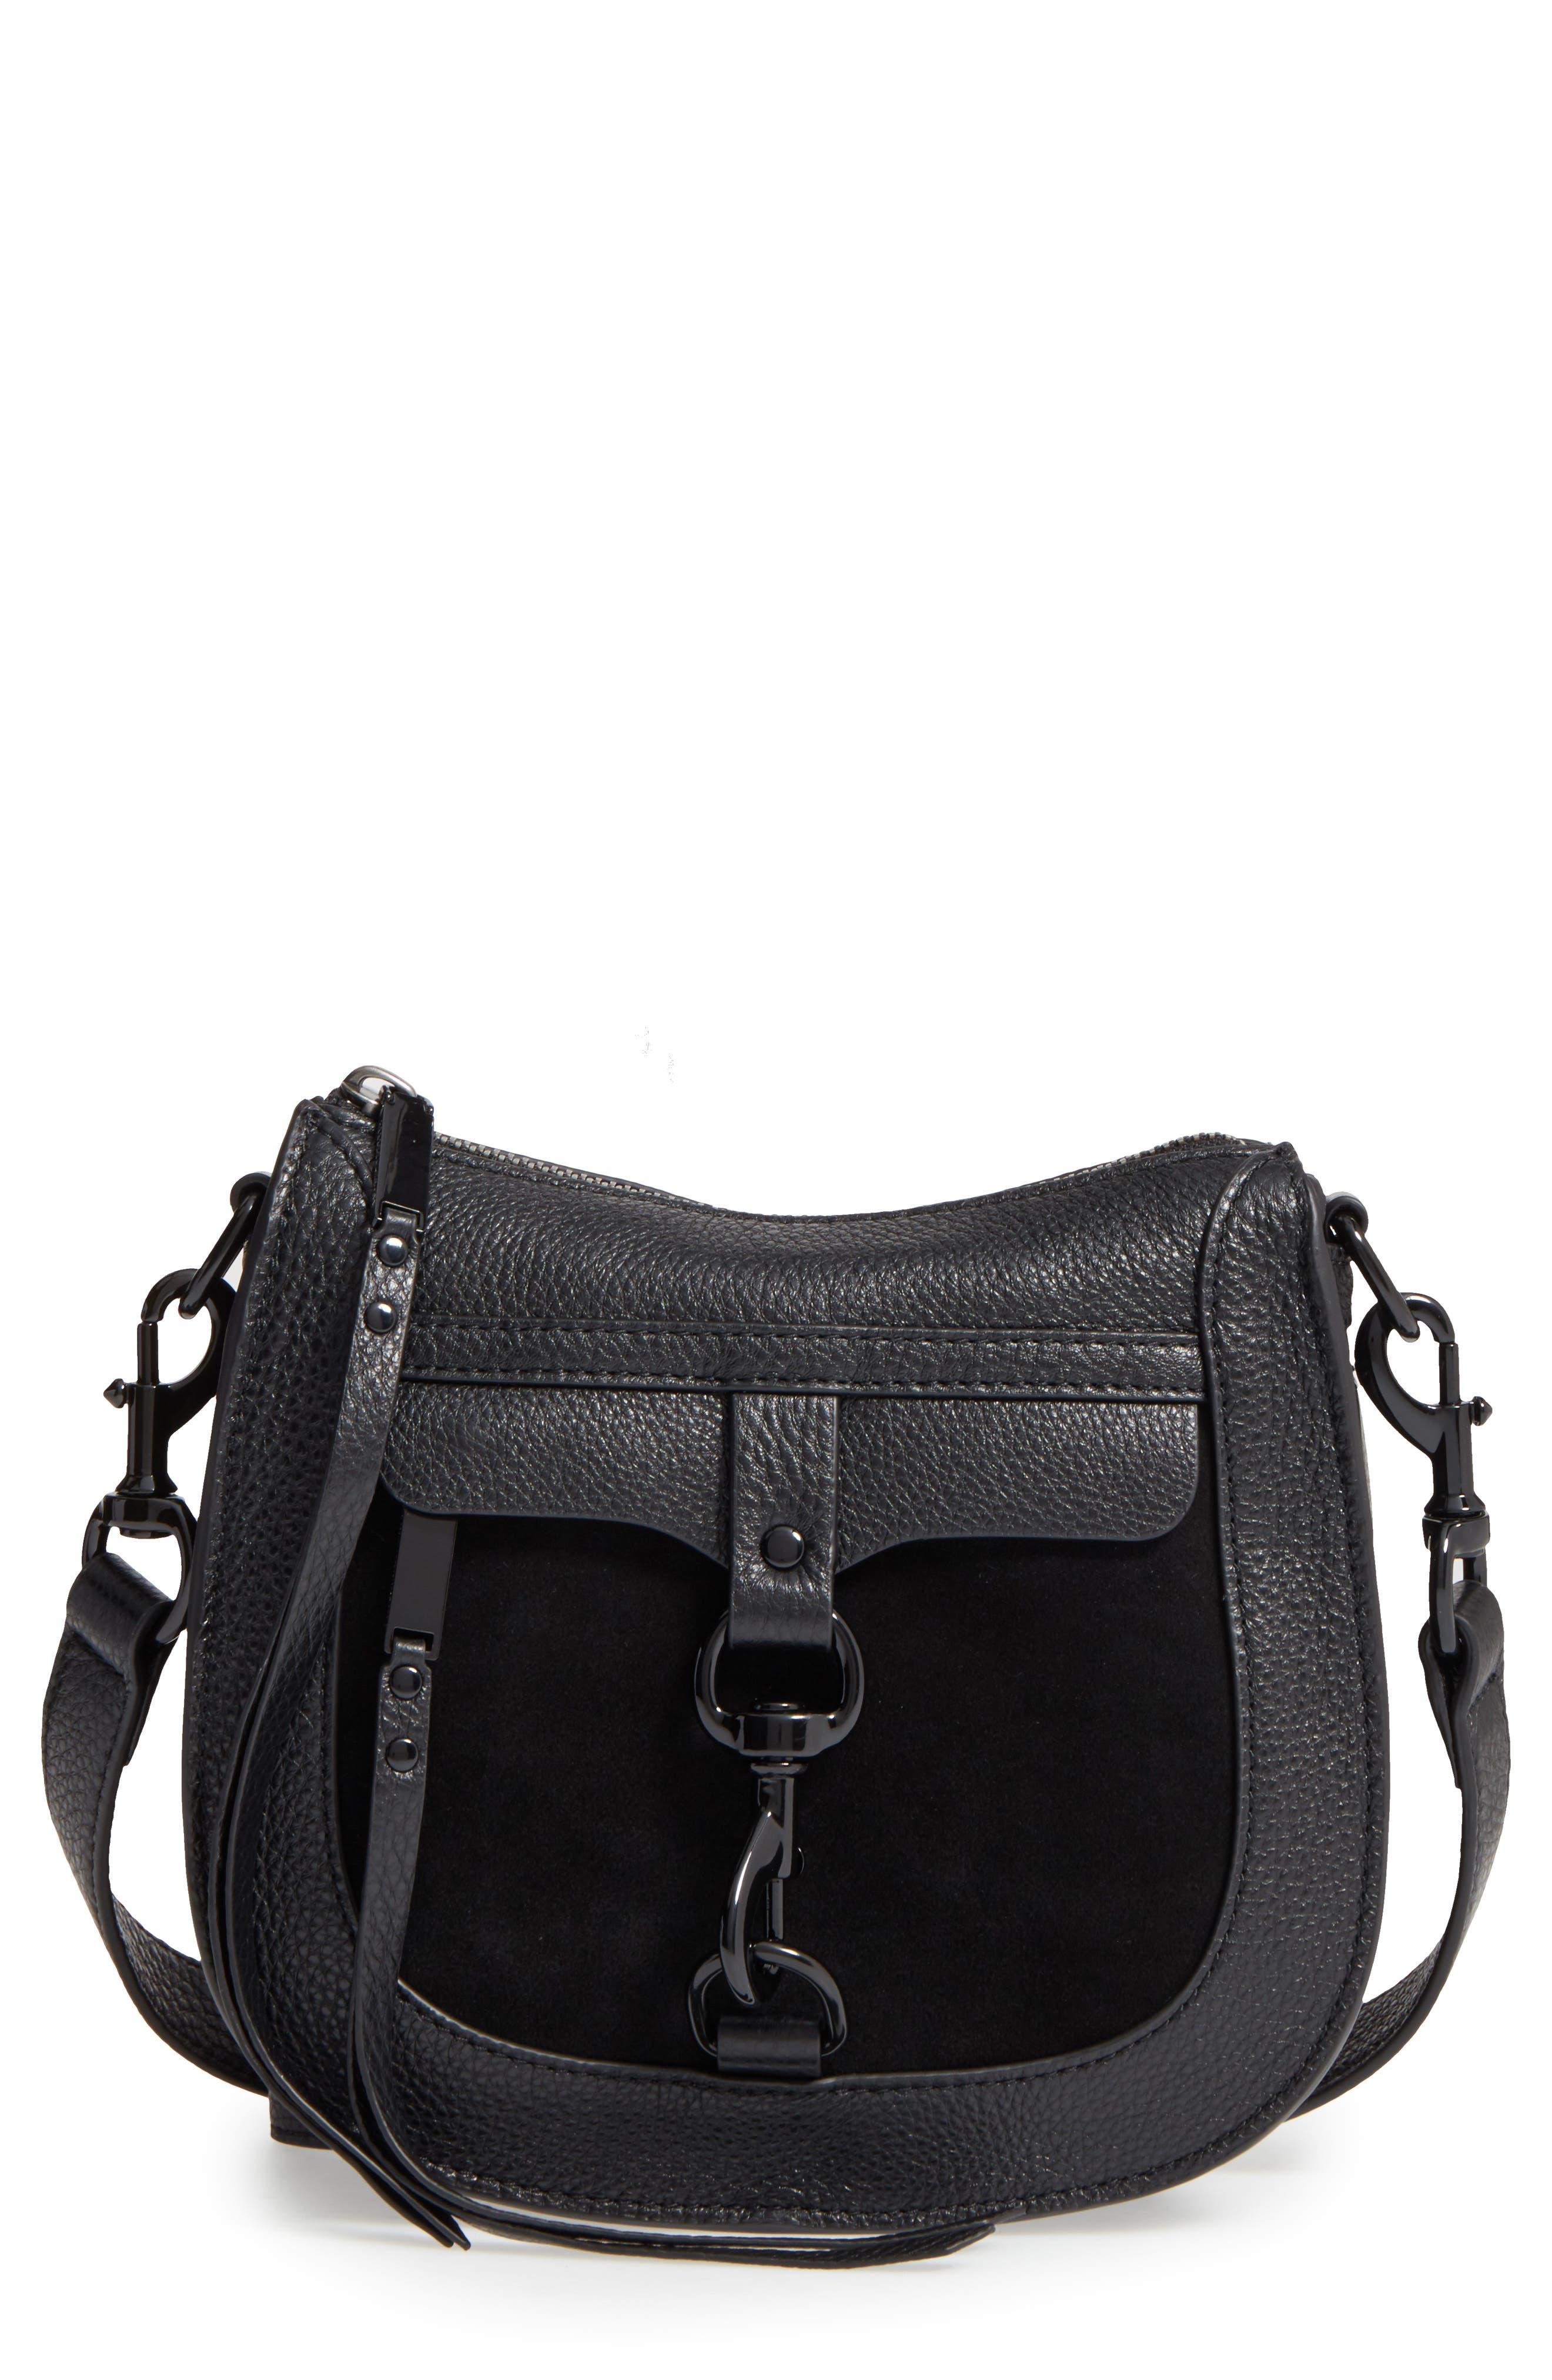 Main Image - Rebecca Minkoff Dog Clip Leather & Suede Saddle Bag (Nordstrom Exclusive)